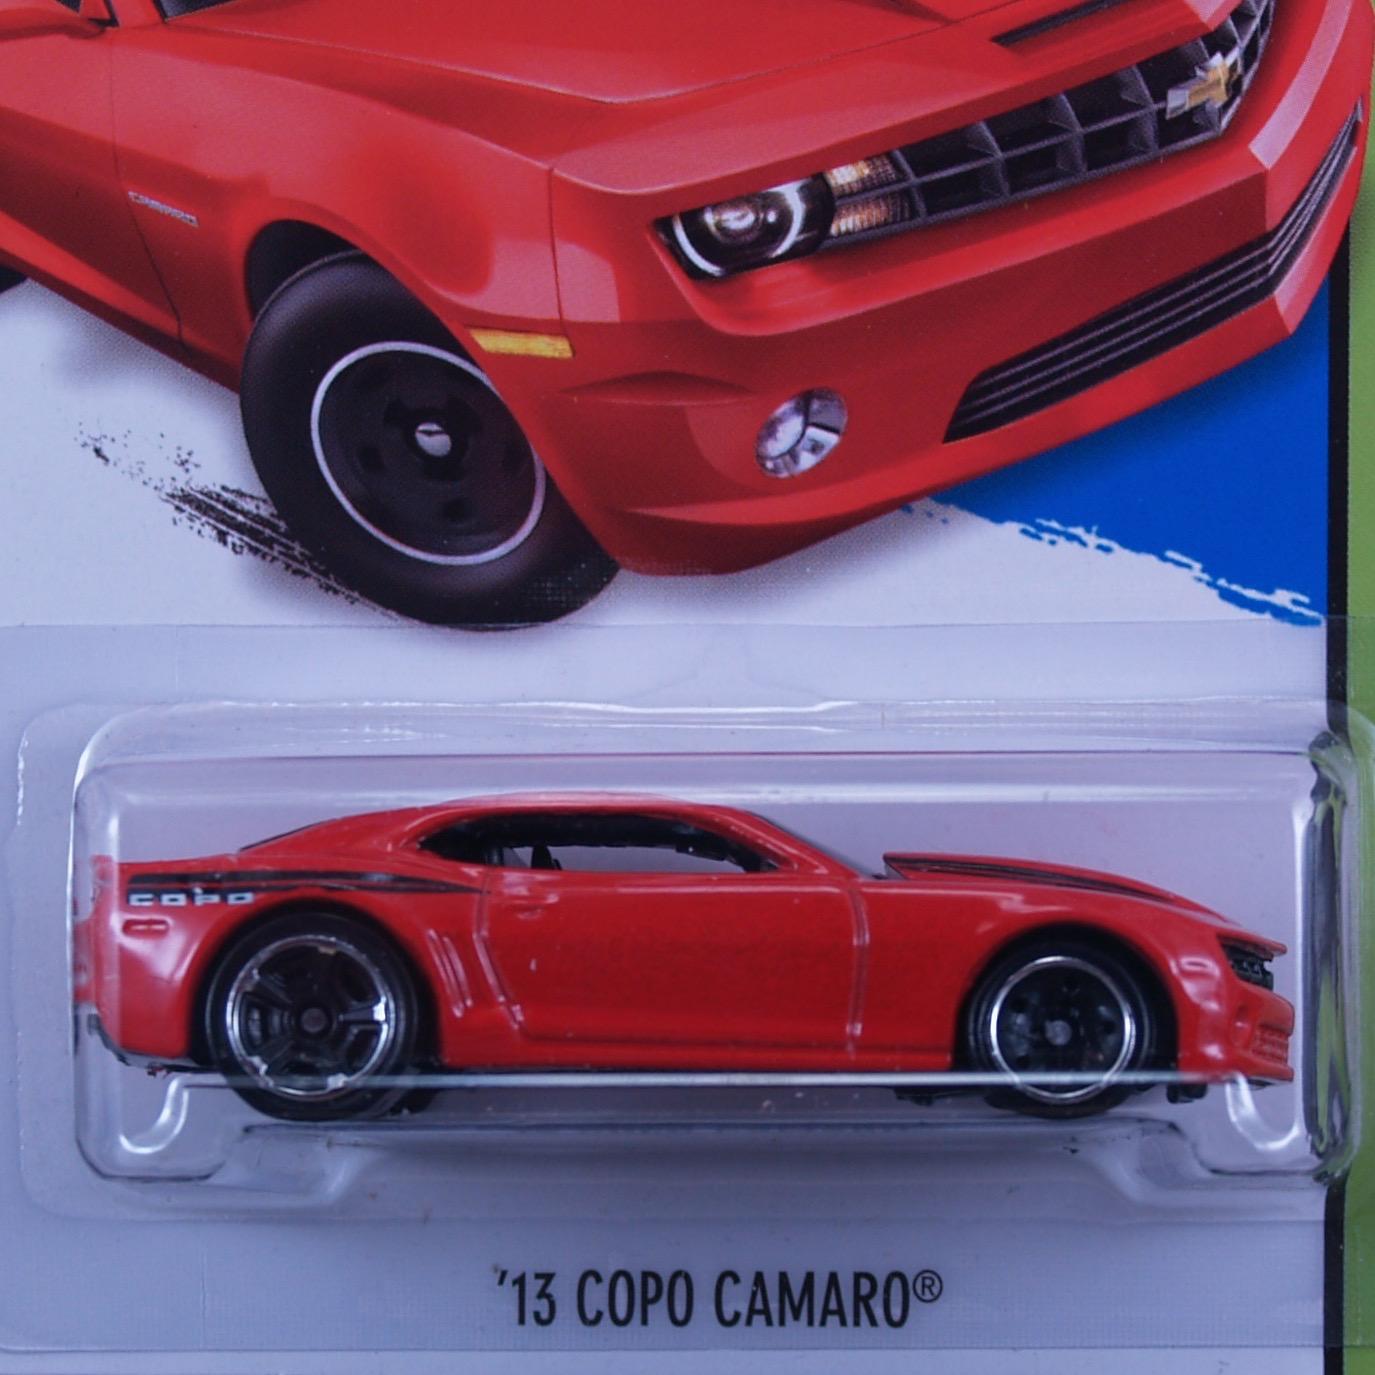 2014 HW WORKSHOP / '13 COPO Camaro (RED)